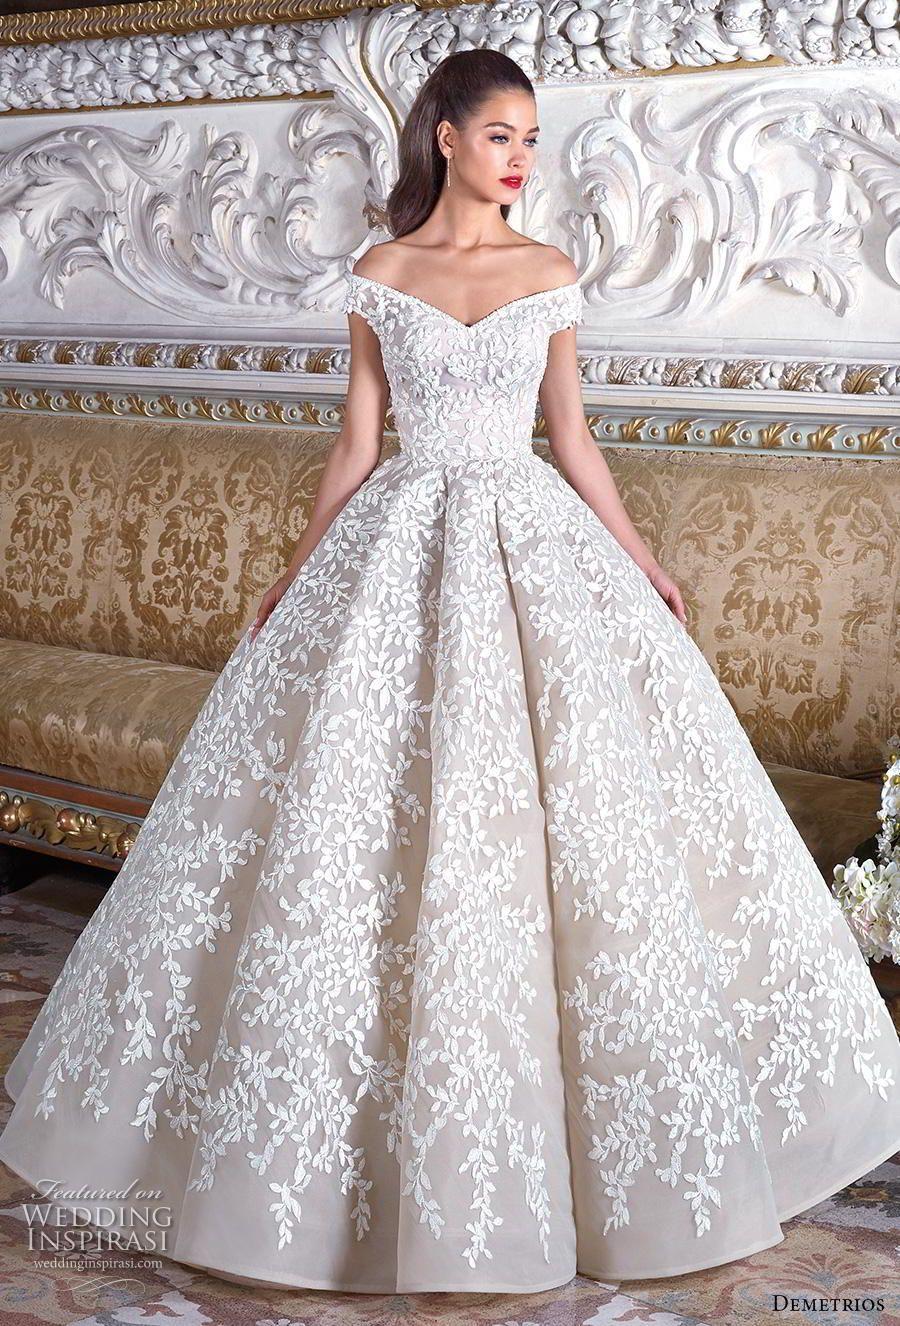 Platinum By Demetrios 2019 Wedding Dresses Wedding Inspirasi Ball Gown Wedding Dress Wedding Dress Guide Wedding Dresses